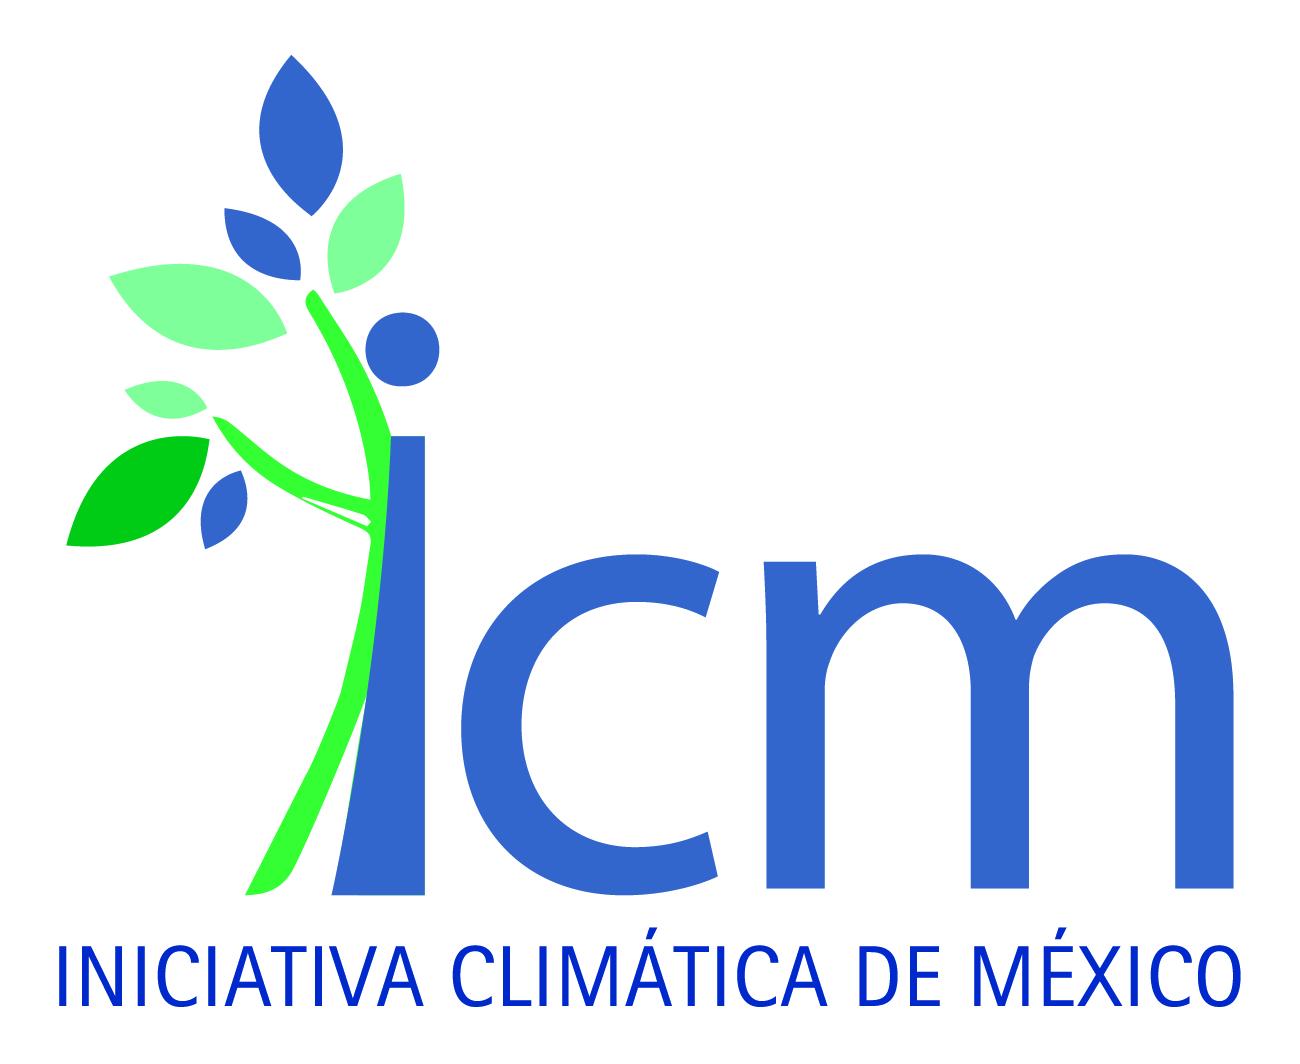 Iniciativa Climática de México